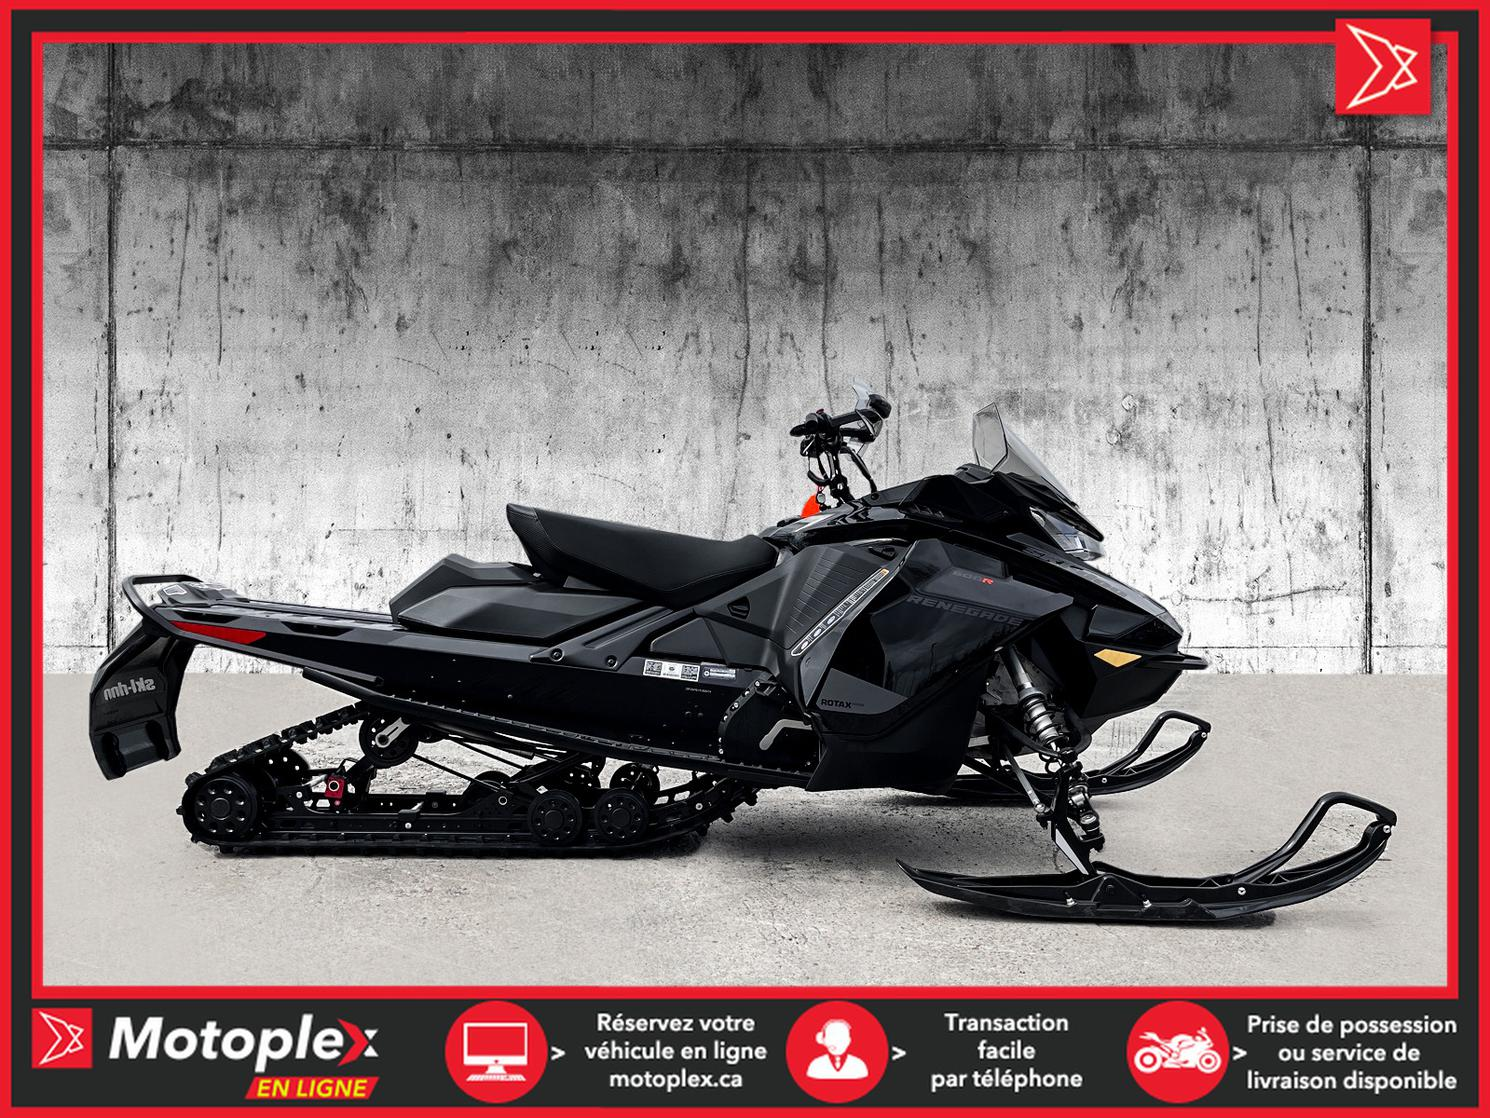 2021 Ski-Doo RENEGADE ADRENALINE  600 E-TEC - 38$/SEMAINE